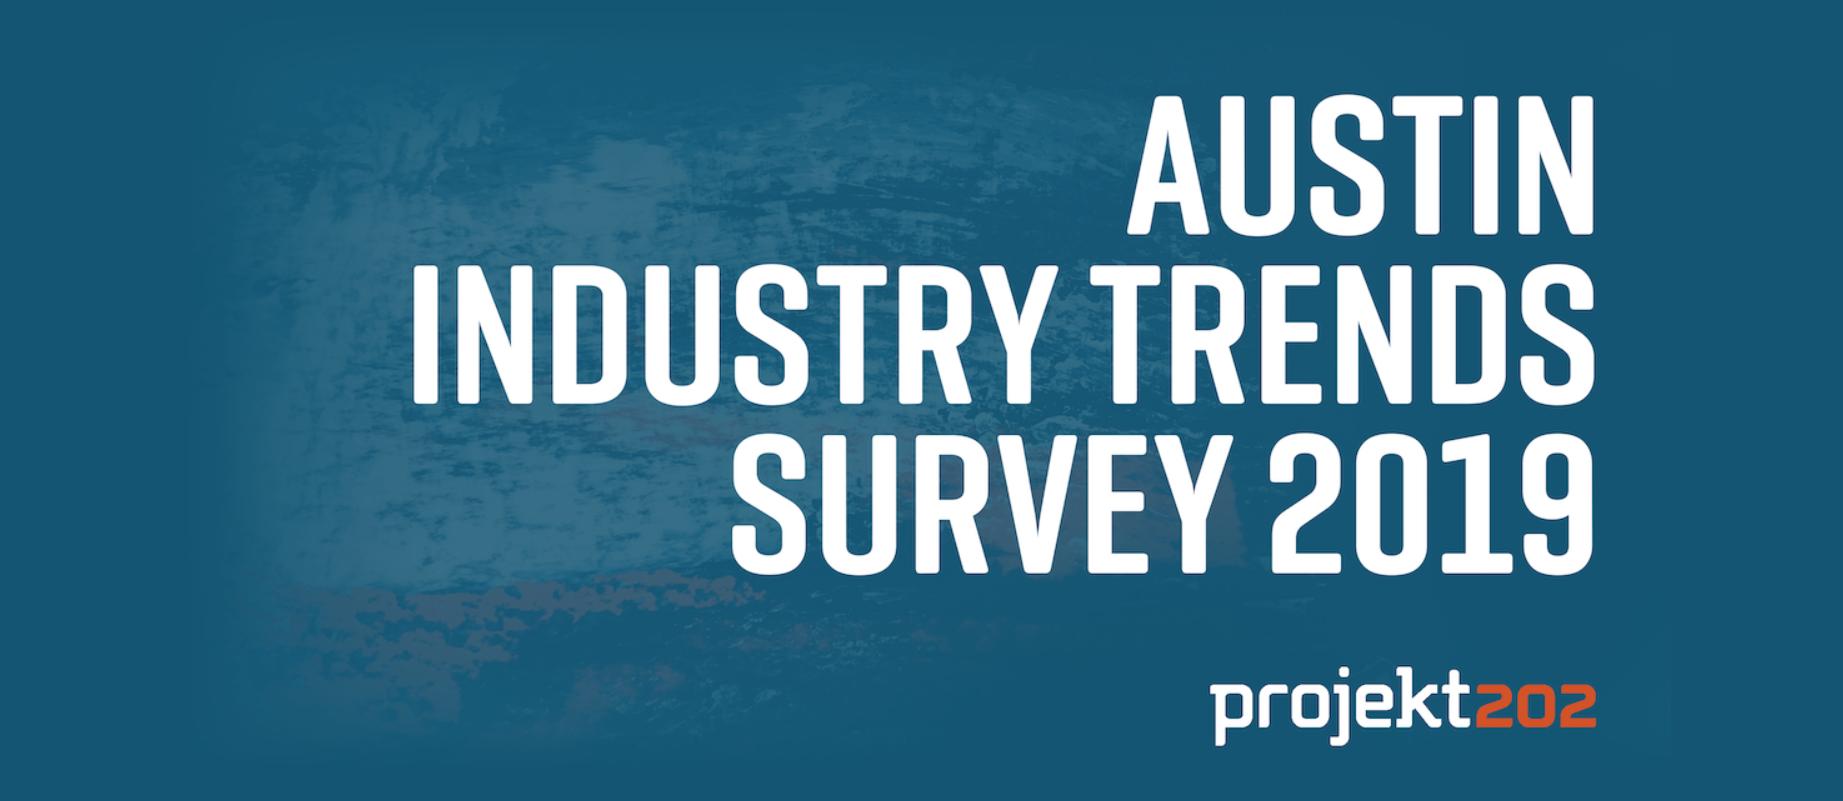 AUS survey header.png